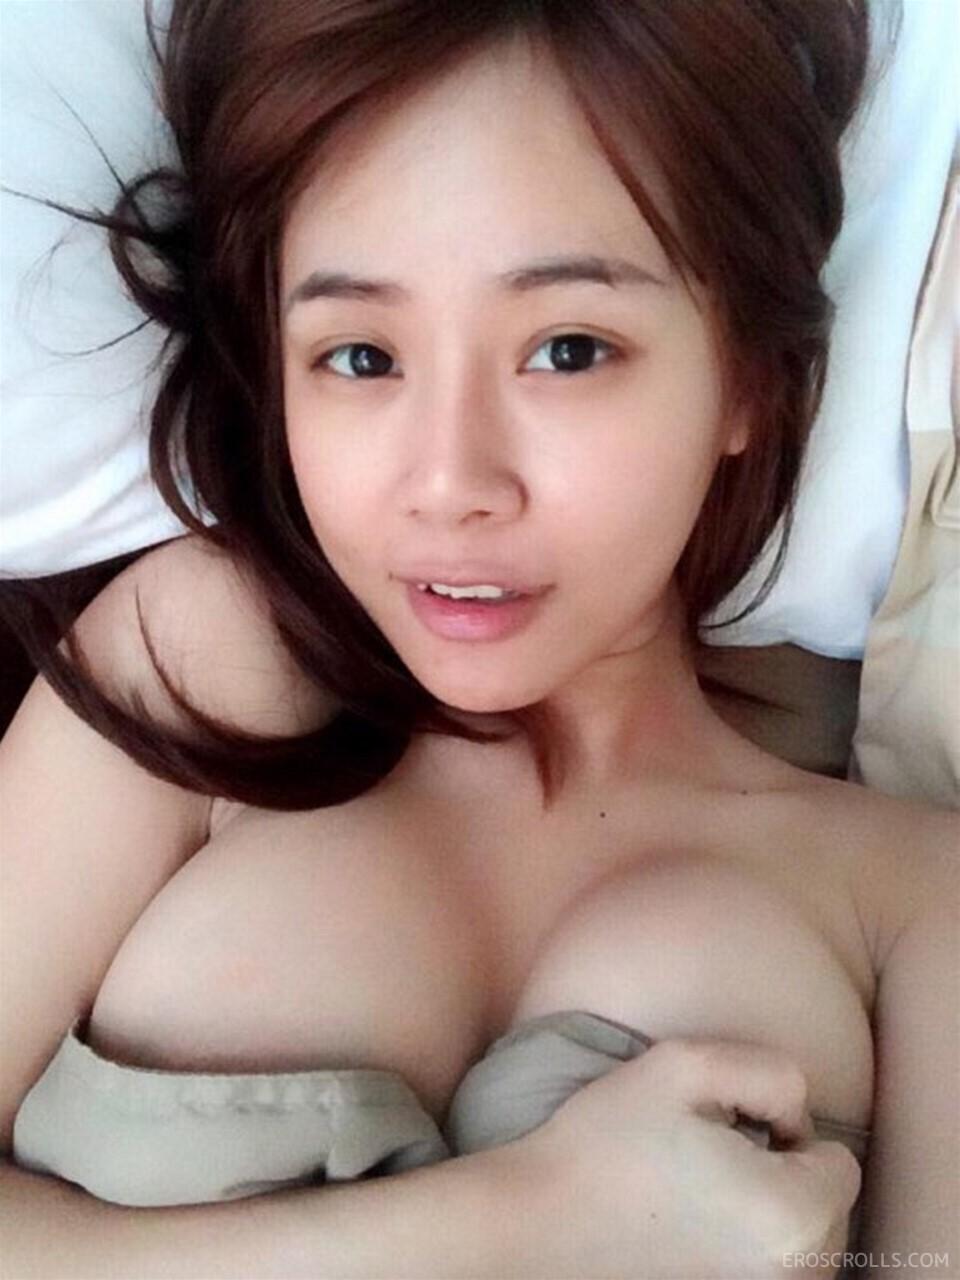 bo032